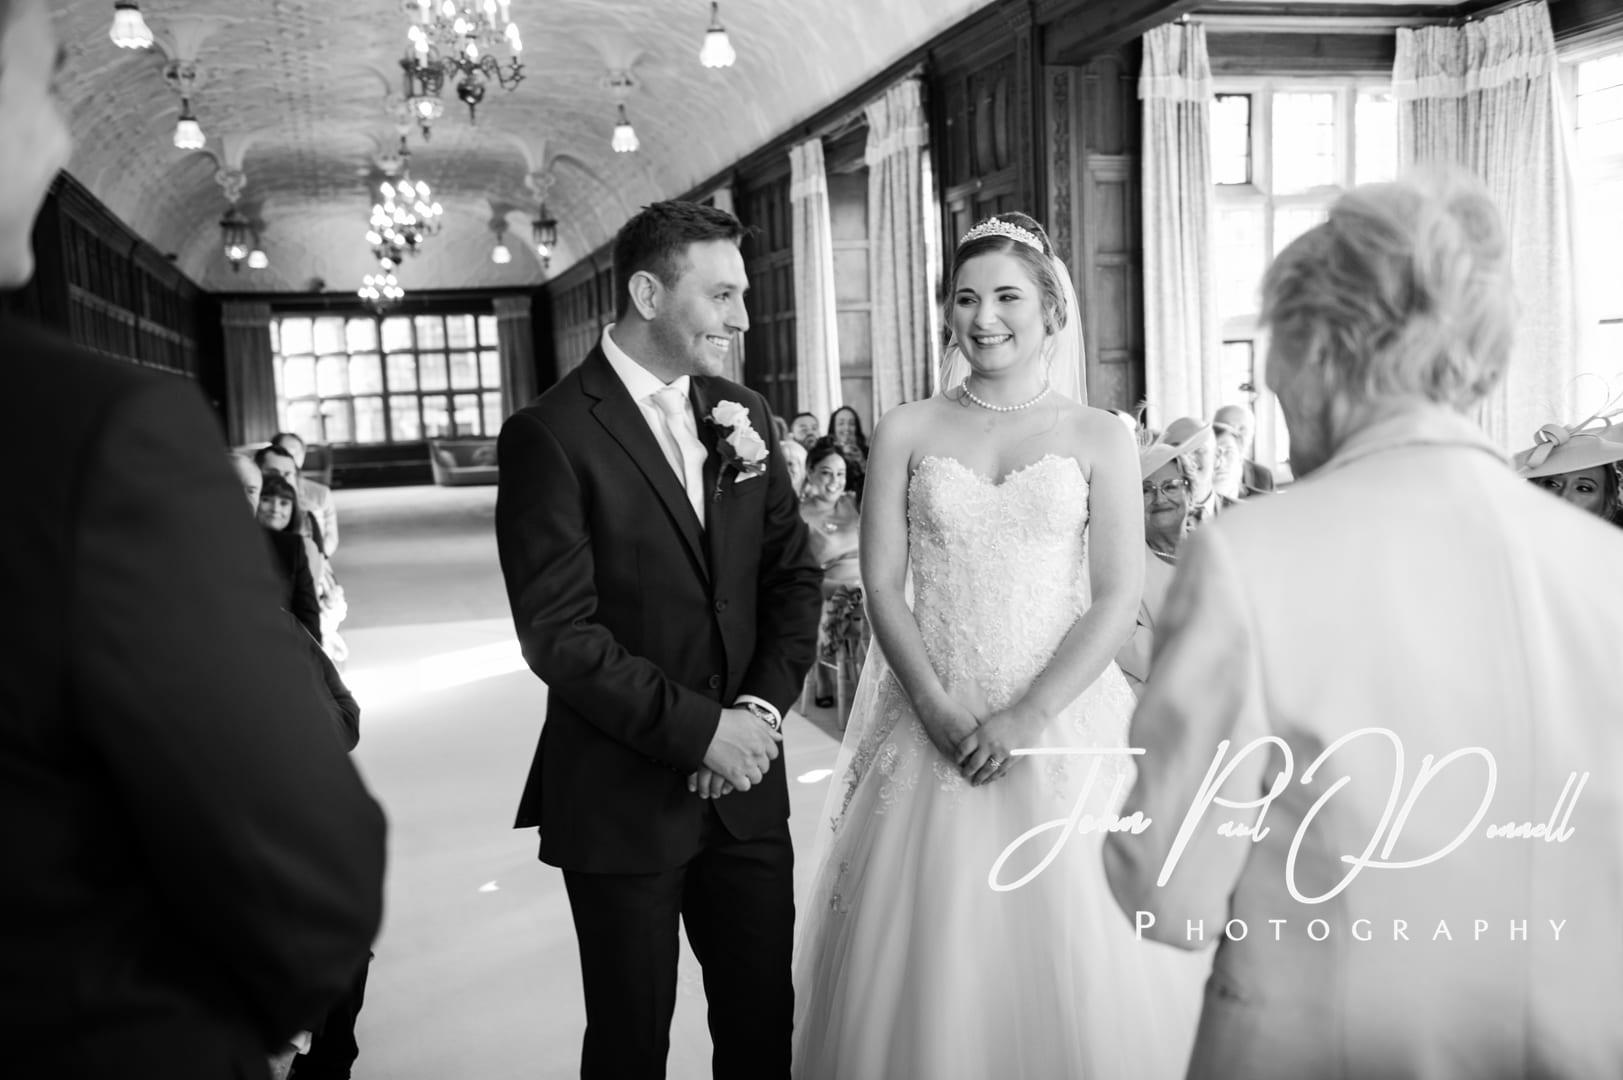 Tamara and Joshua Wedding at Fanhams Hall